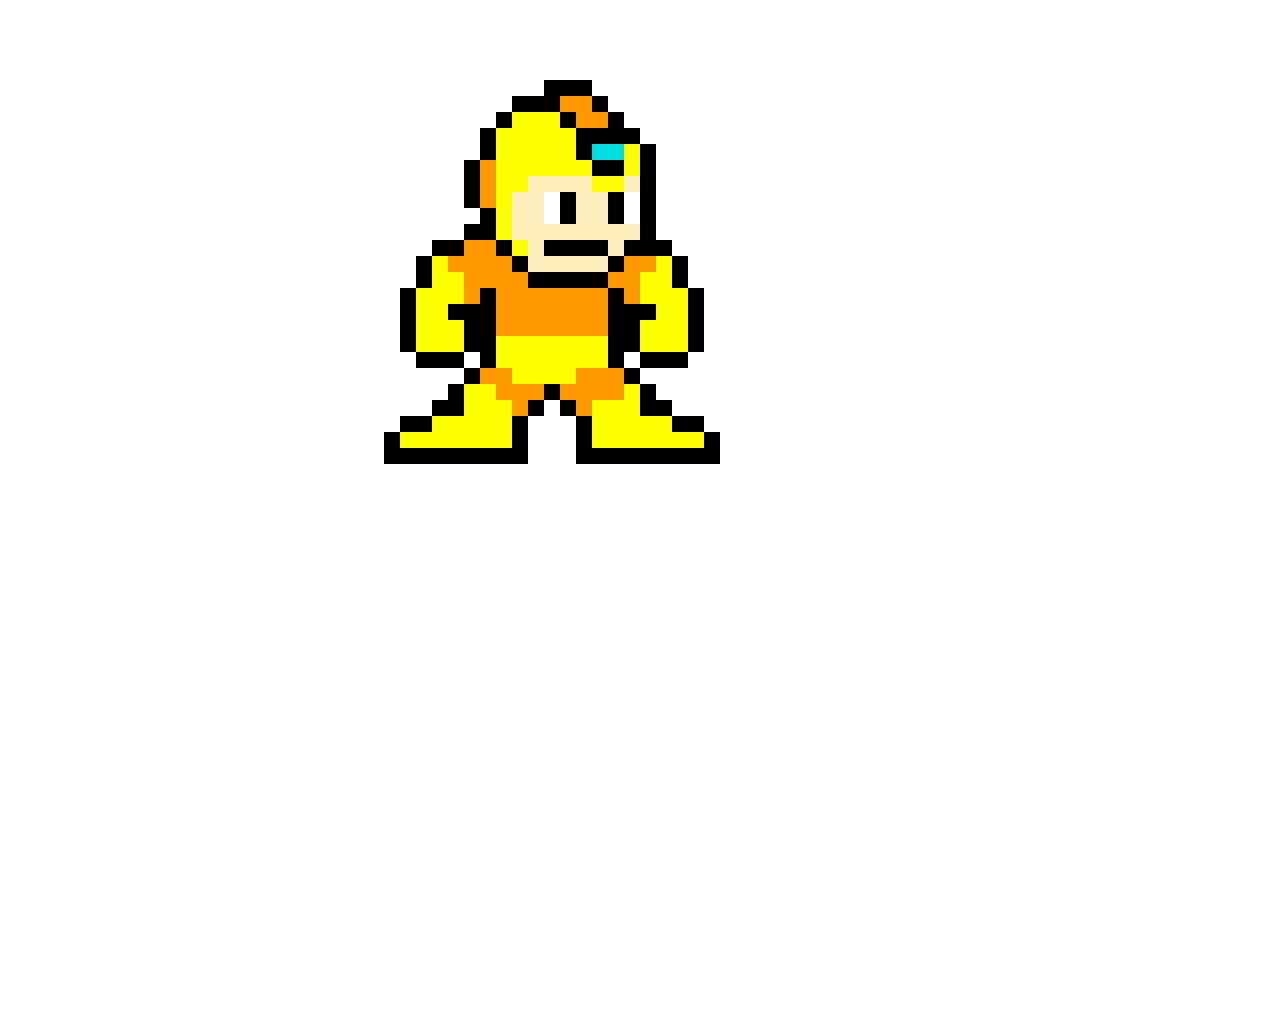 Megaman's Super Transformation (Credit: Dankmaster)